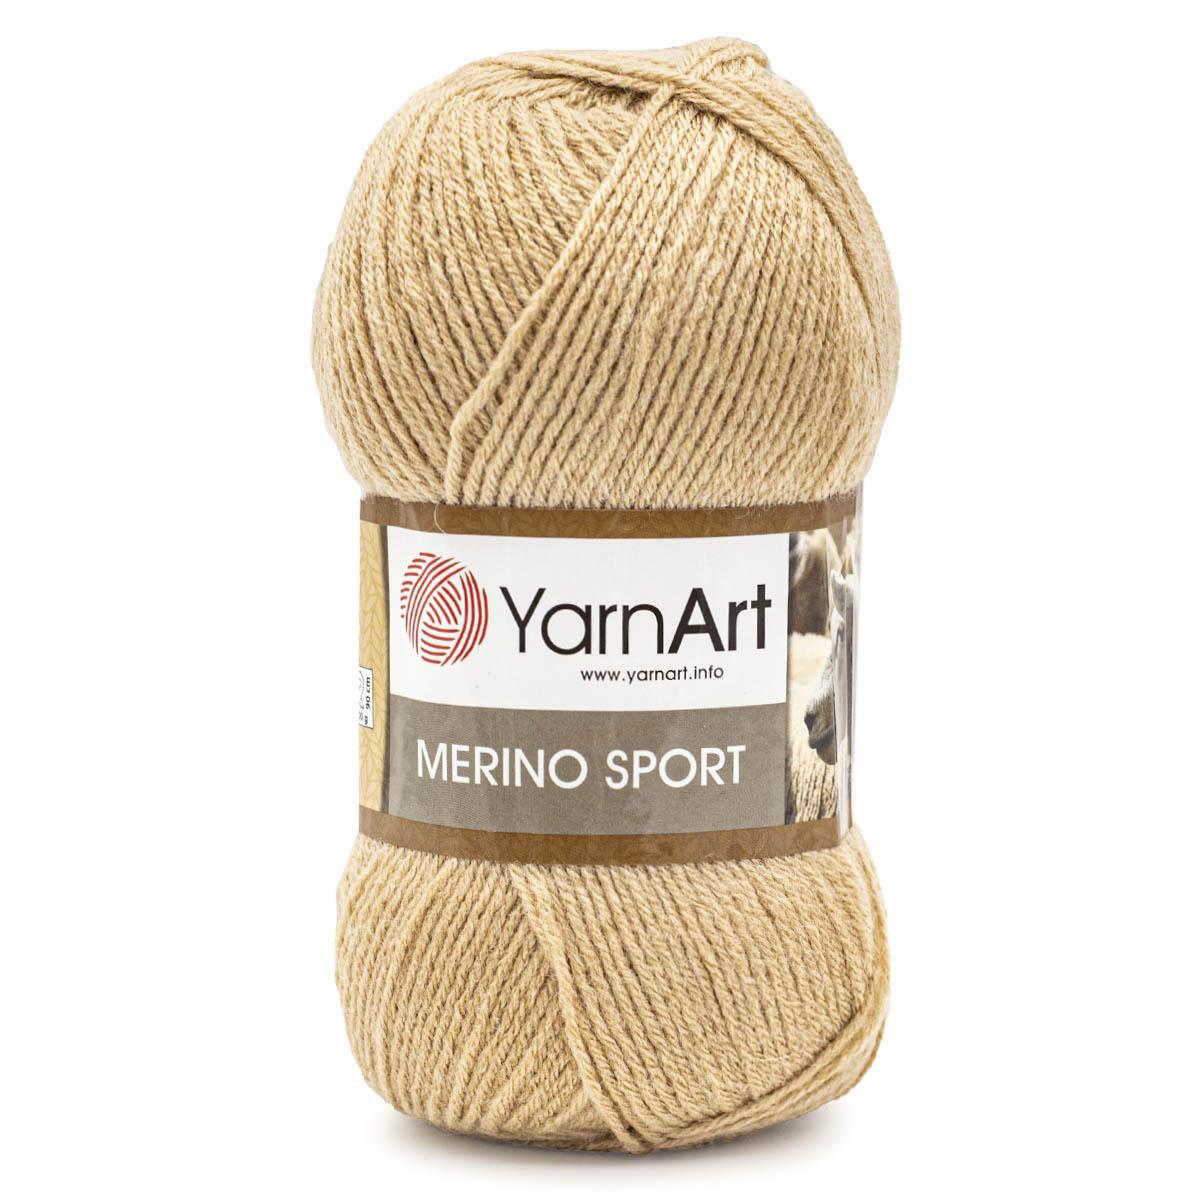 Пряжа YarnArt 'Merino Sport' 100гр 400м (50% шерсть, 50% акрил)